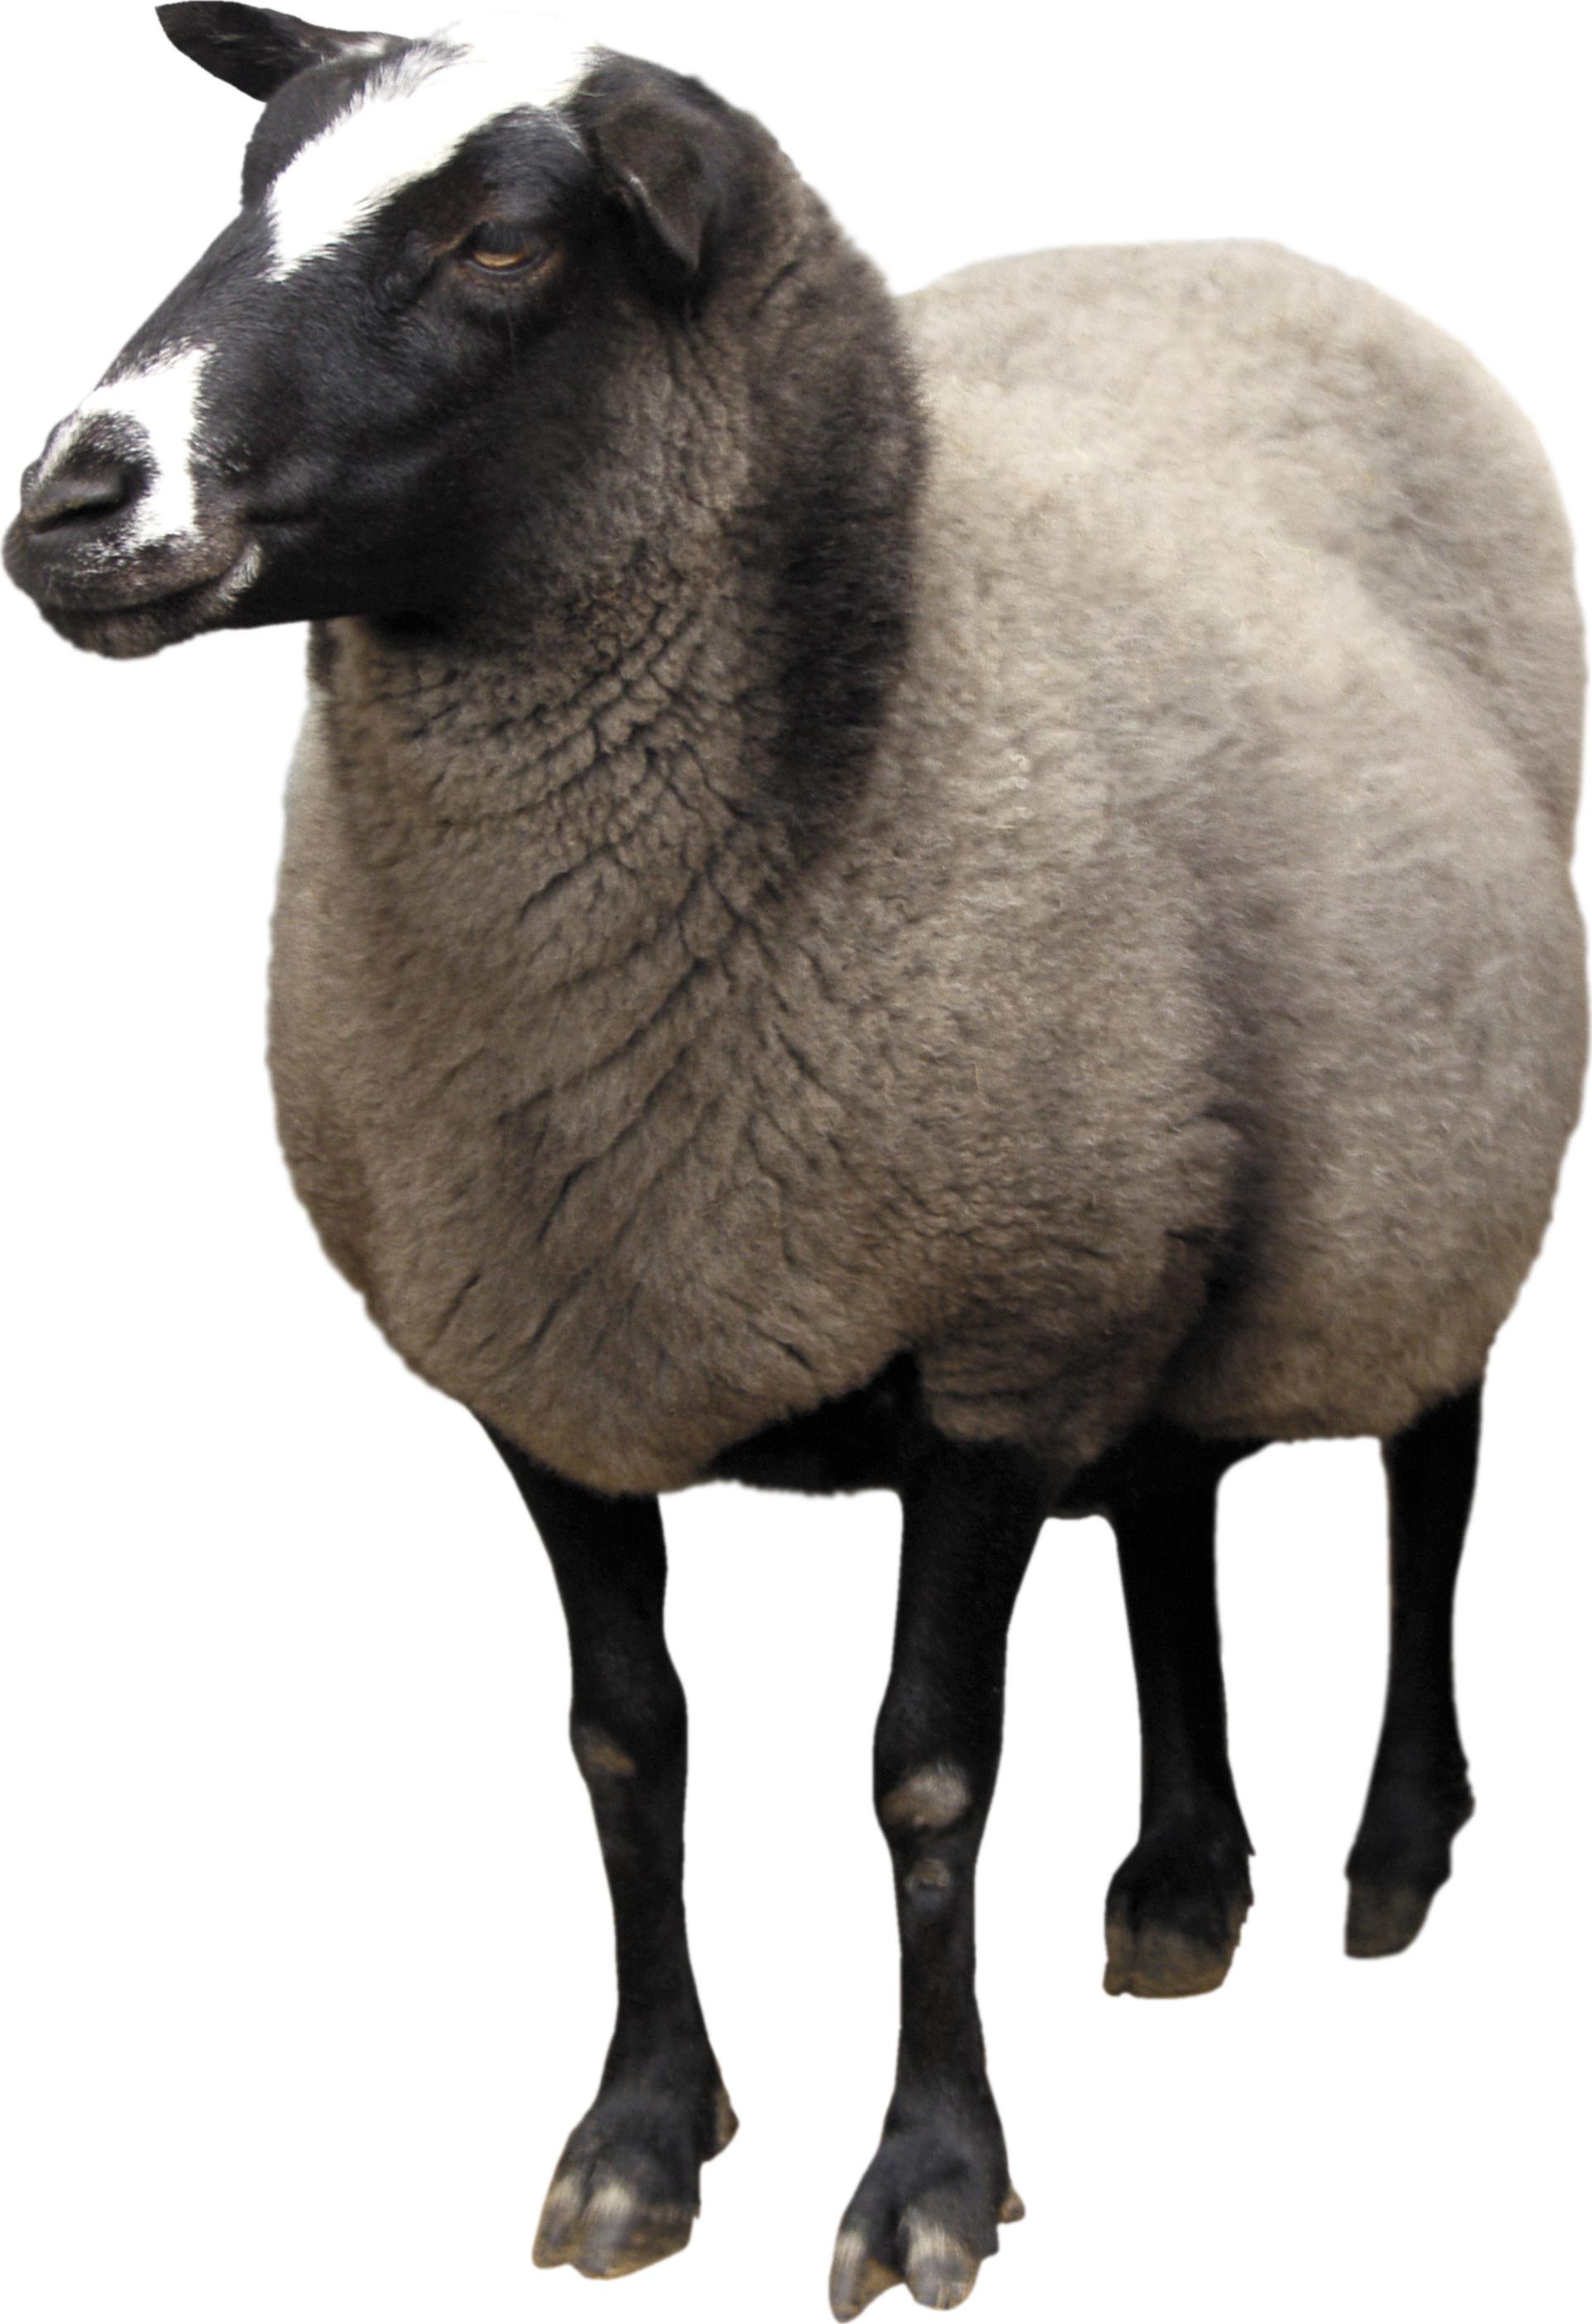 Lamb clipart fat sheep. Png animal pinterest